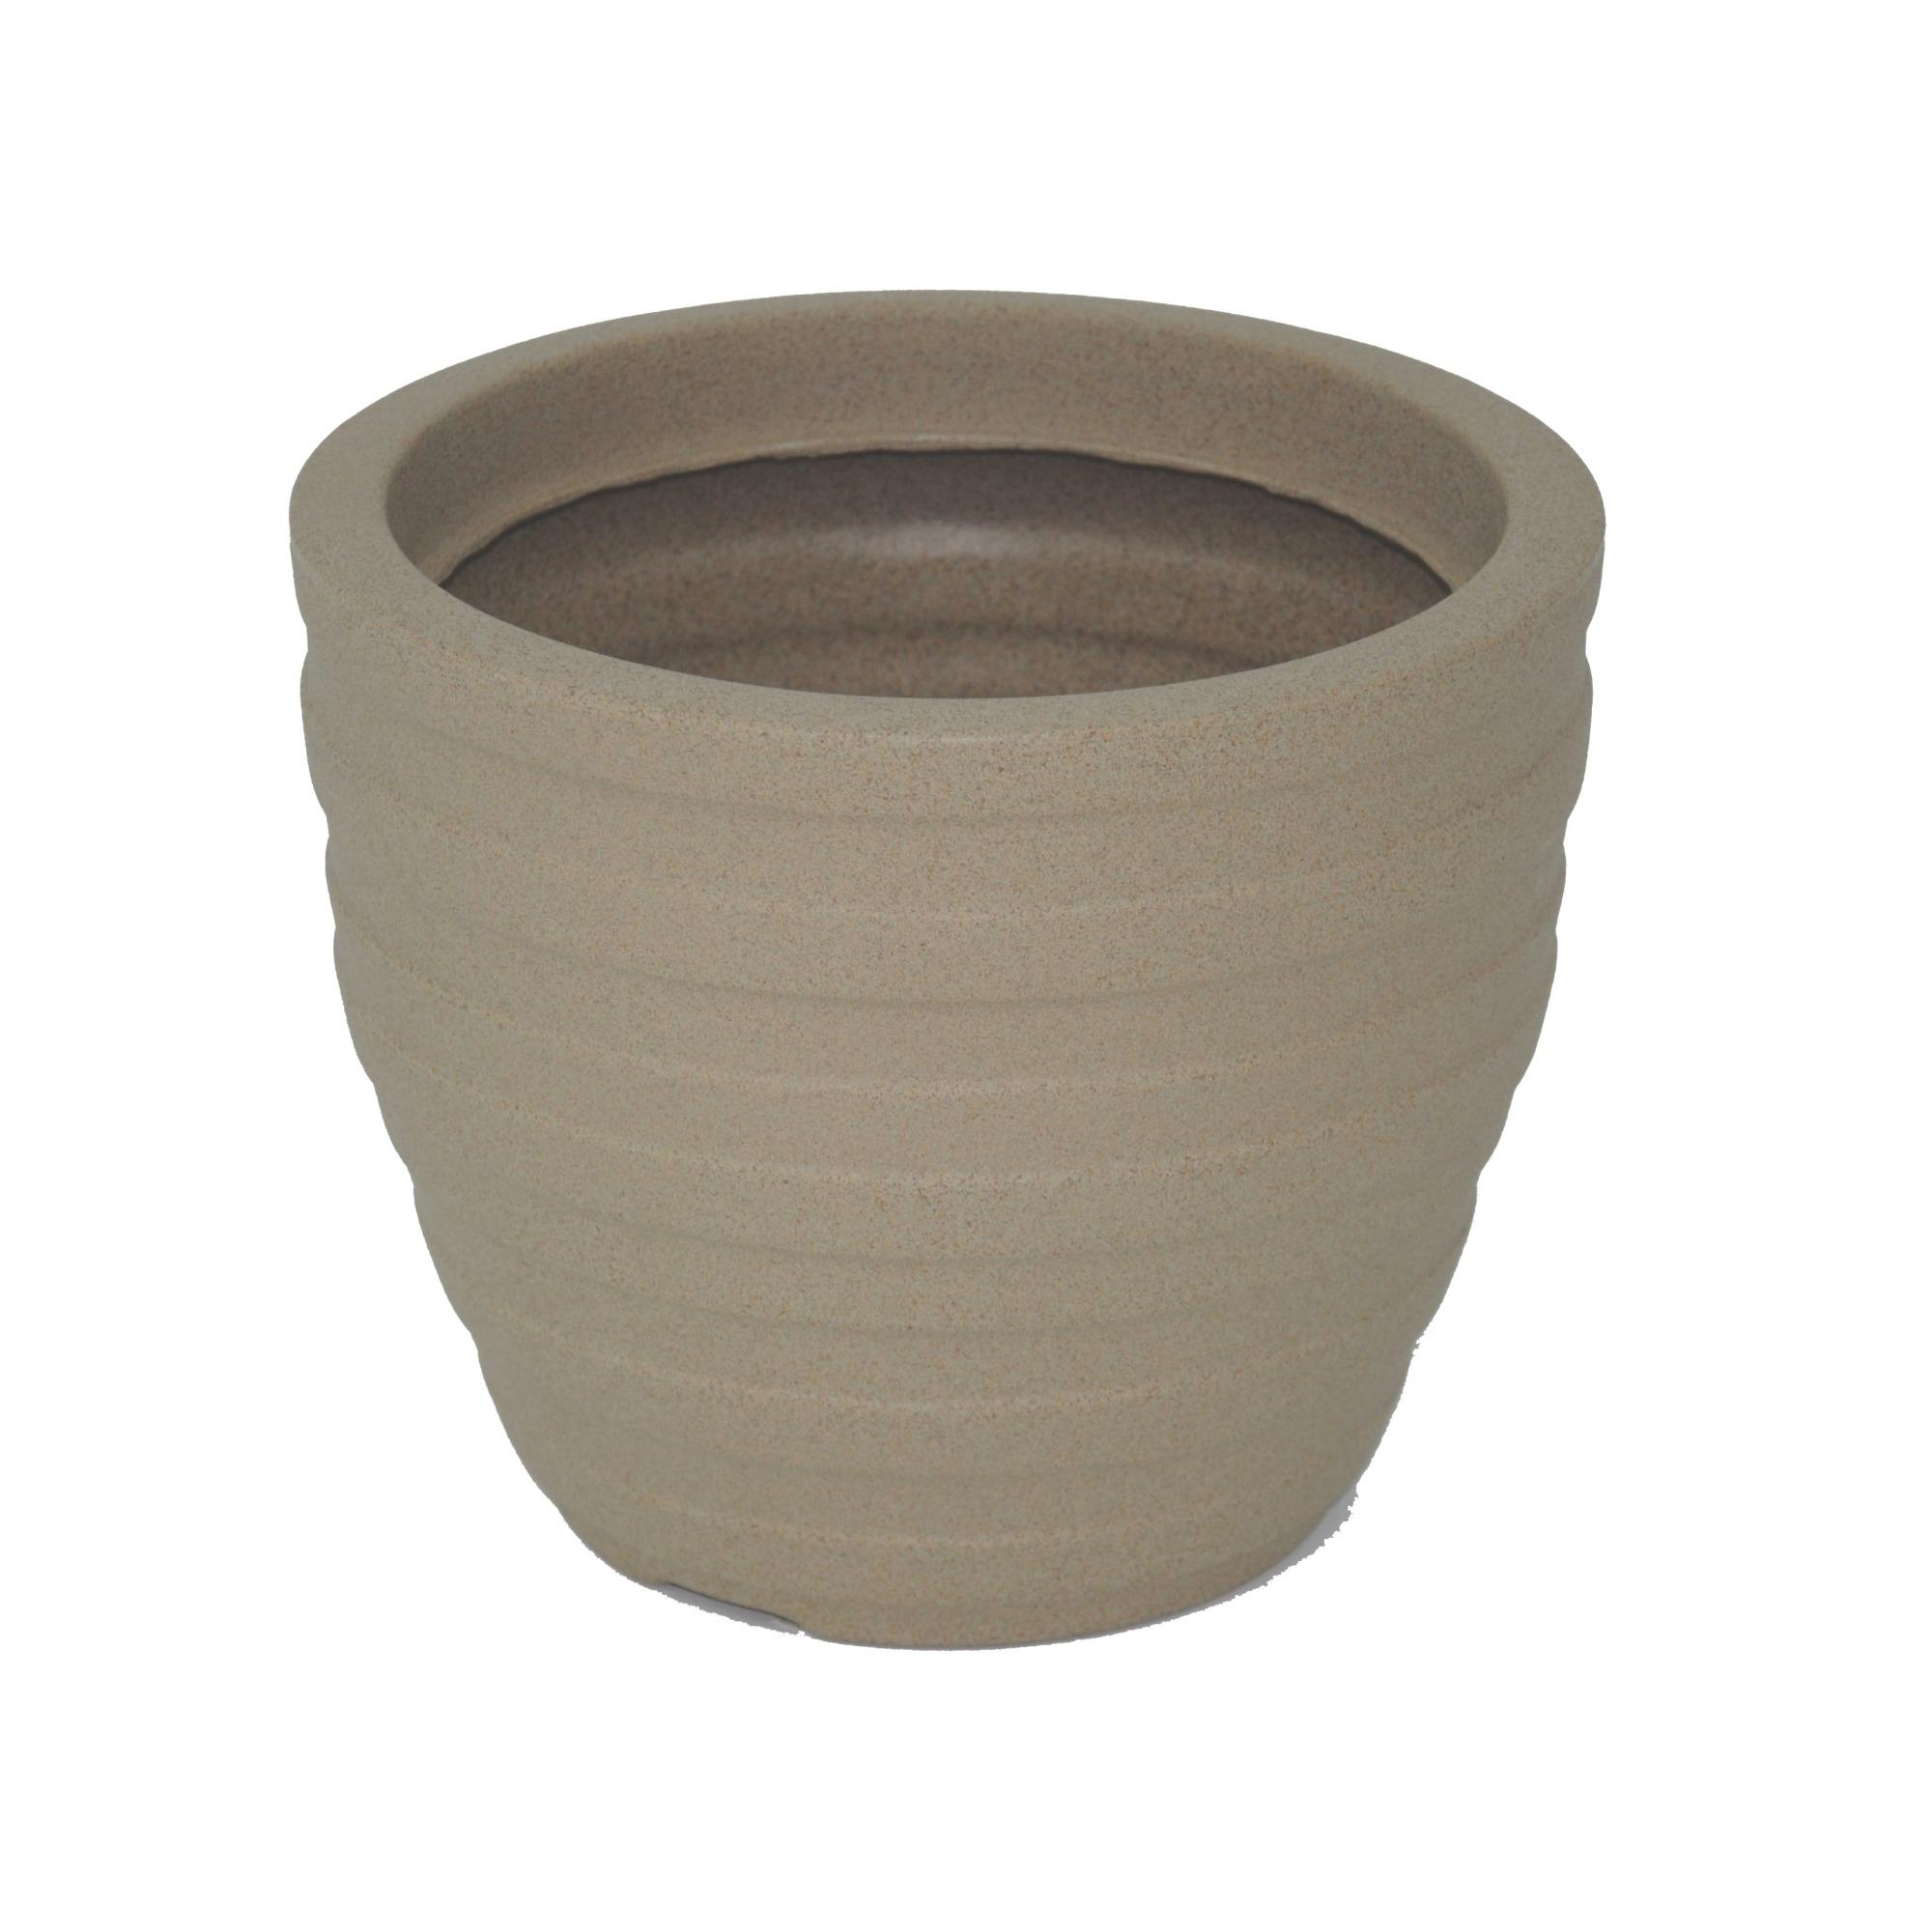 Vaso para Plantas Polietileno 24x285 cm Cor Areia Inca - Tramontina